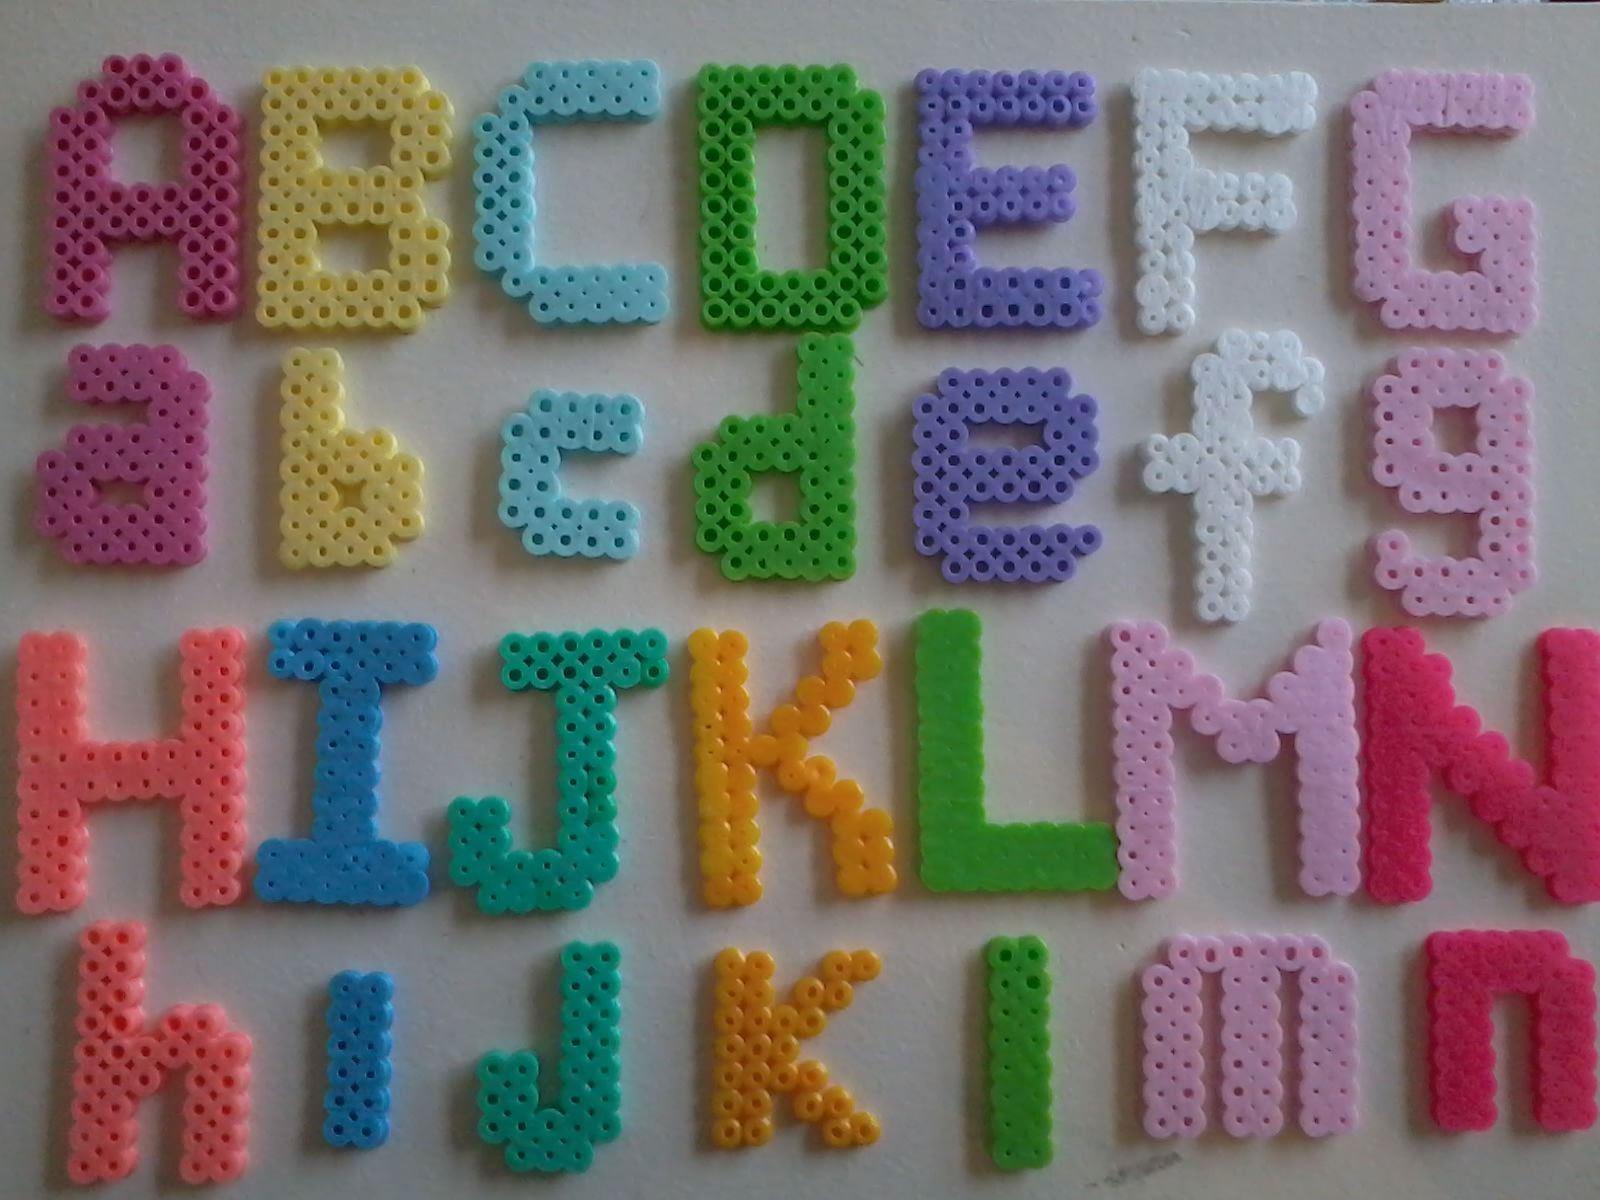 Disney Princess Themed Colored Alphabet Perlarhama Beads